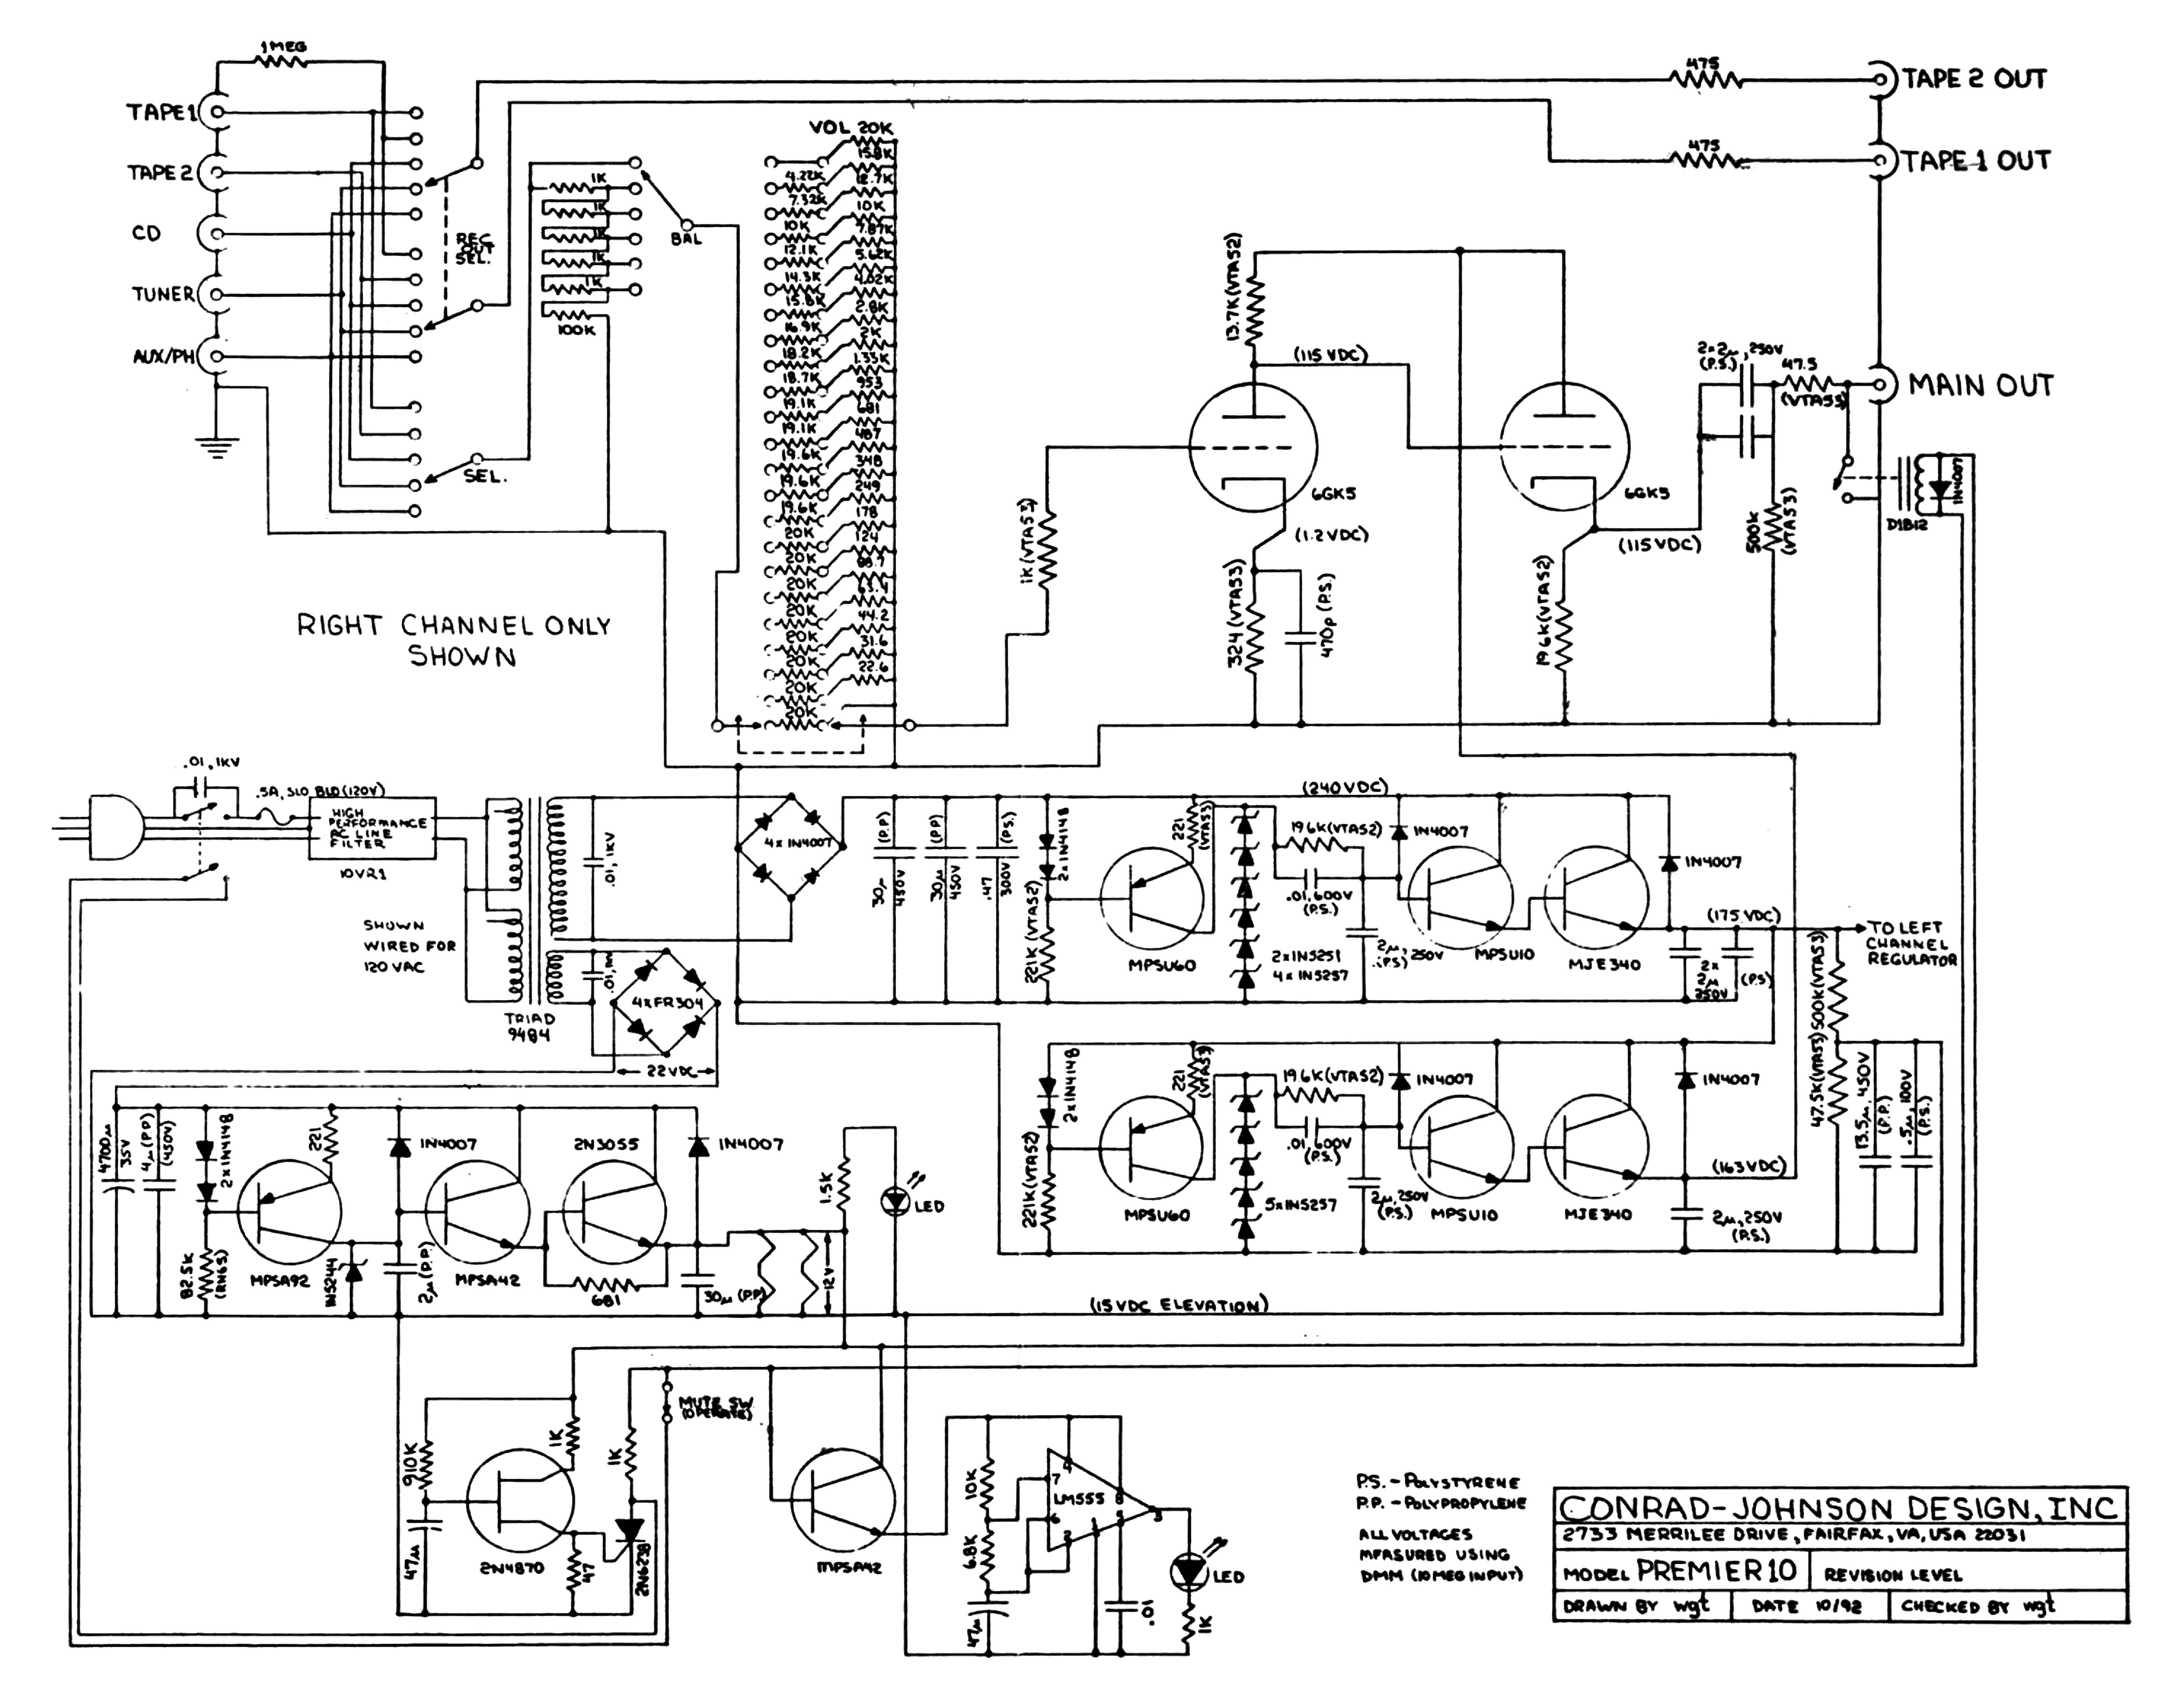 Conrad Johnson Premier Ten Schematic Service Manual Download Evinrude 115 Wiring Diagram Free Picture 1st Page